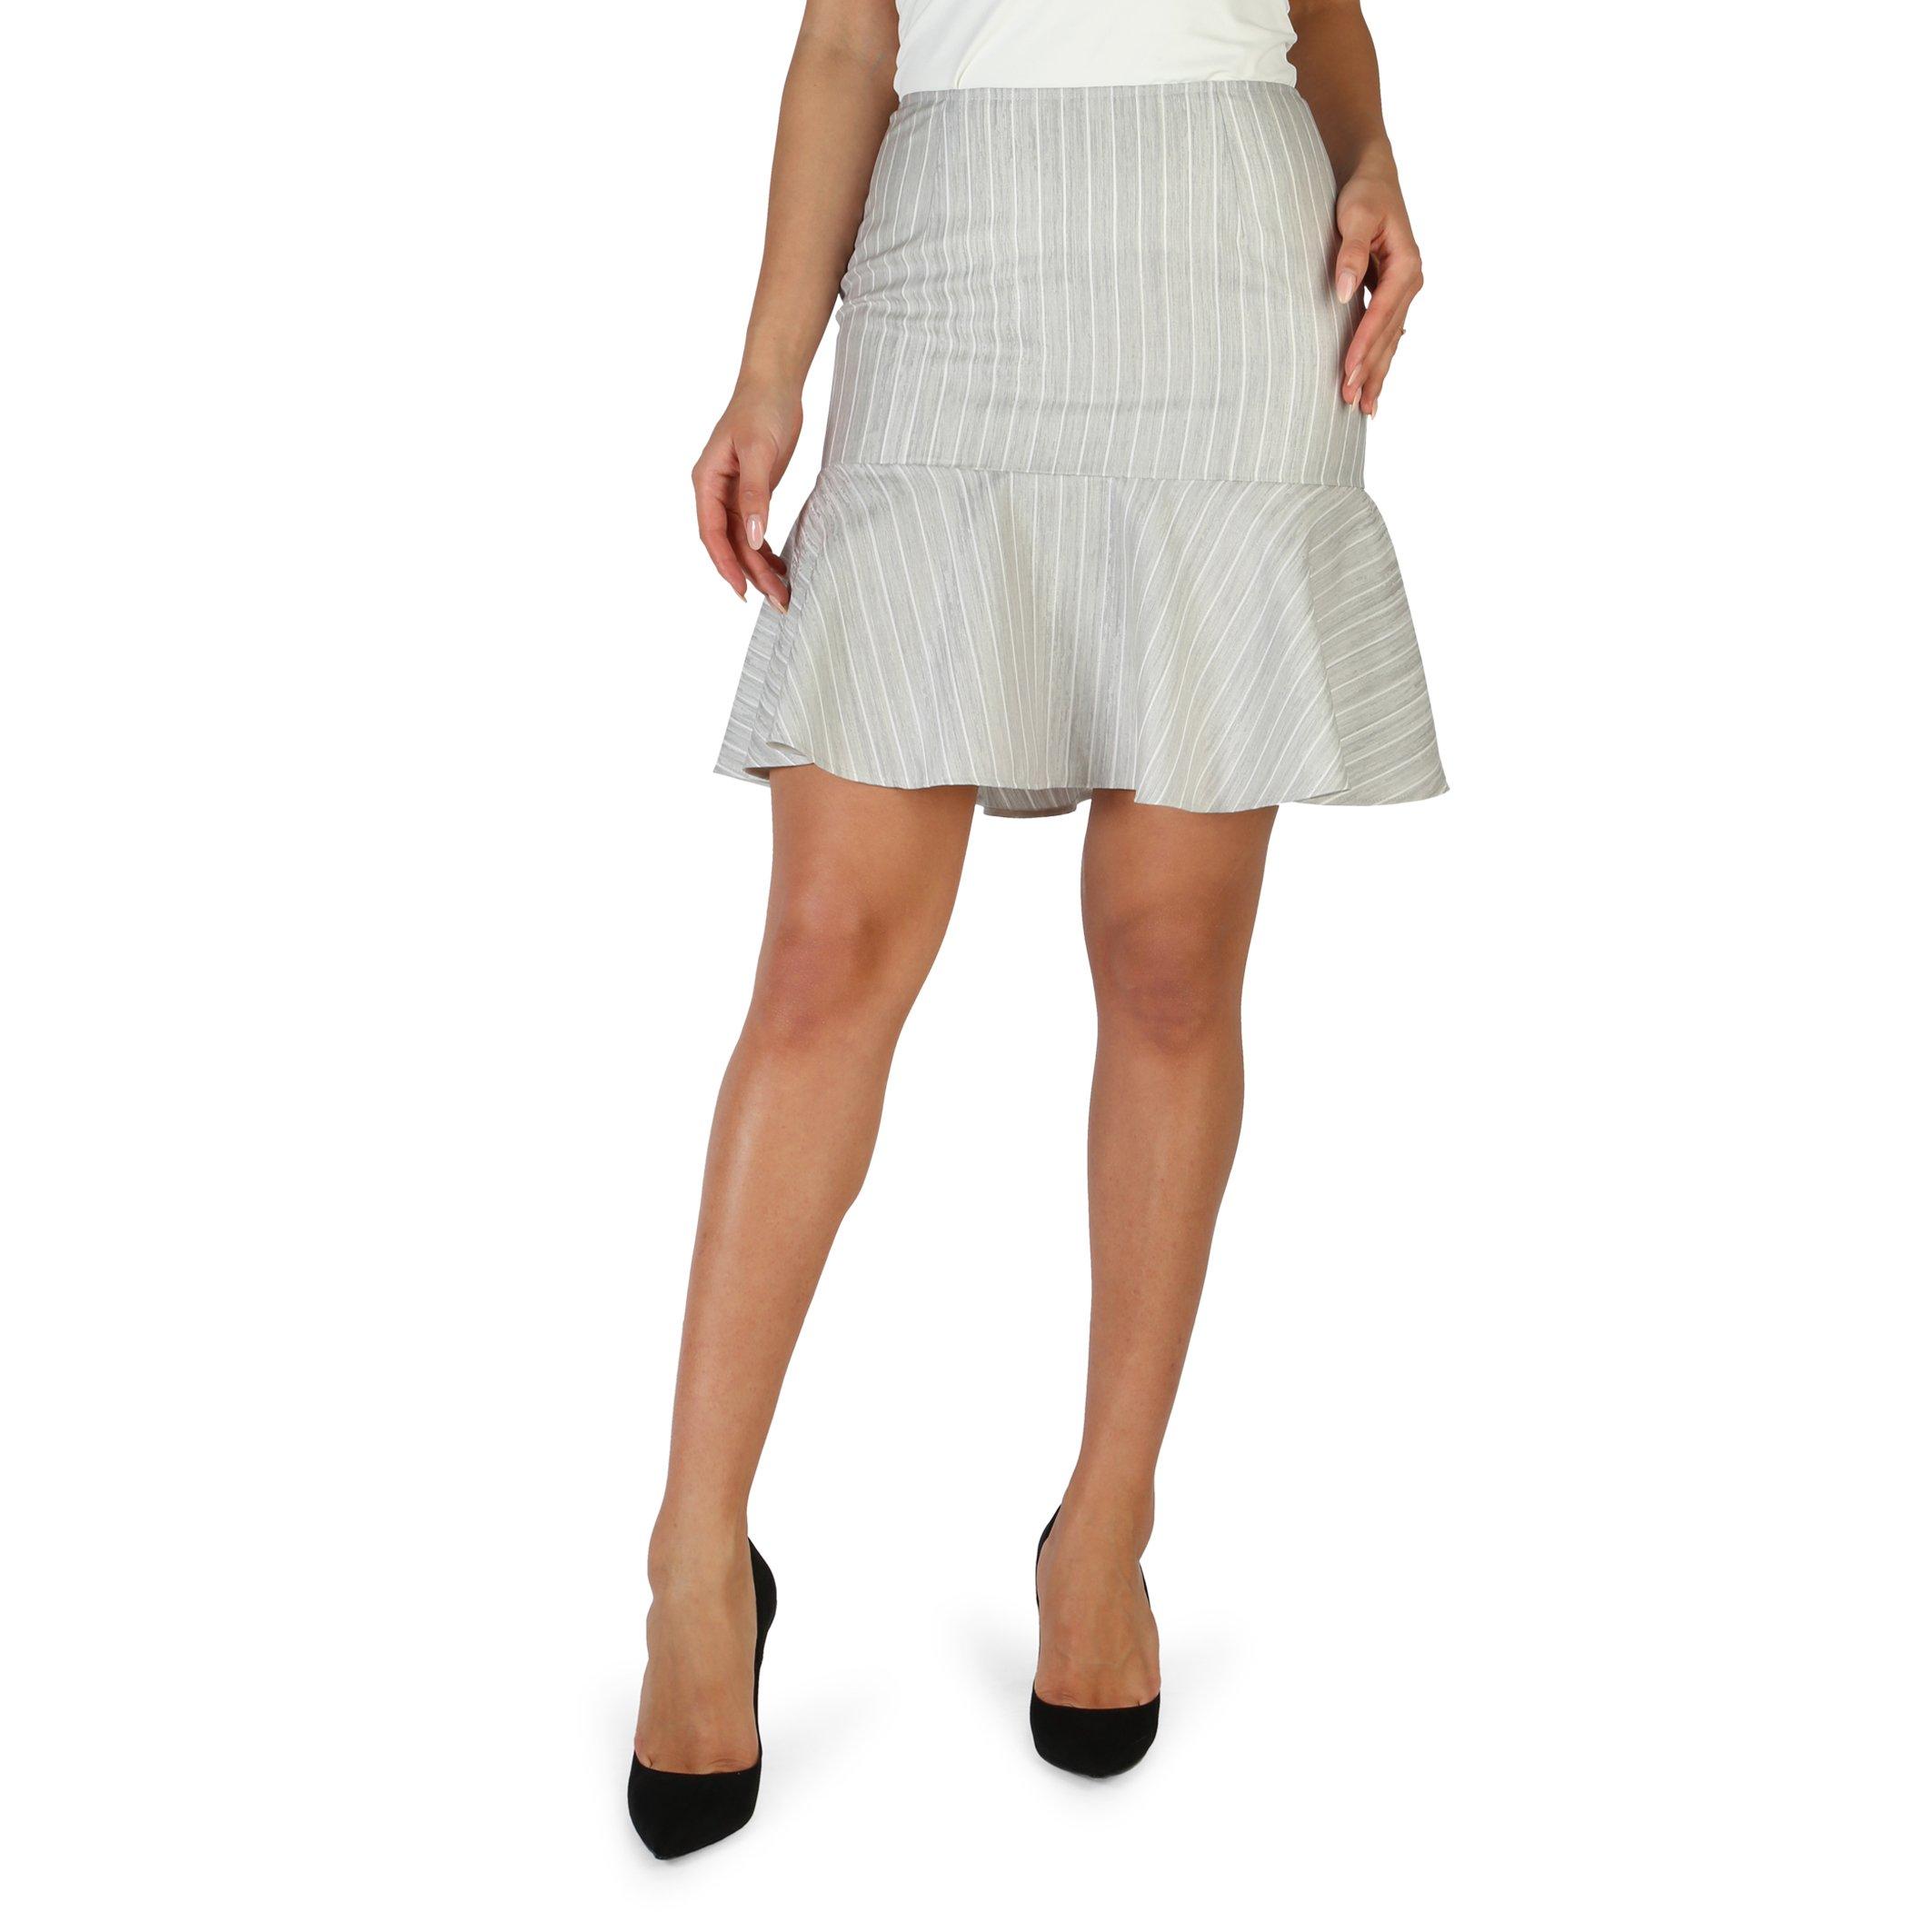 Fontana 2.0 Women's IRIDE Skirt Various Colours 325725 - grey-1 42